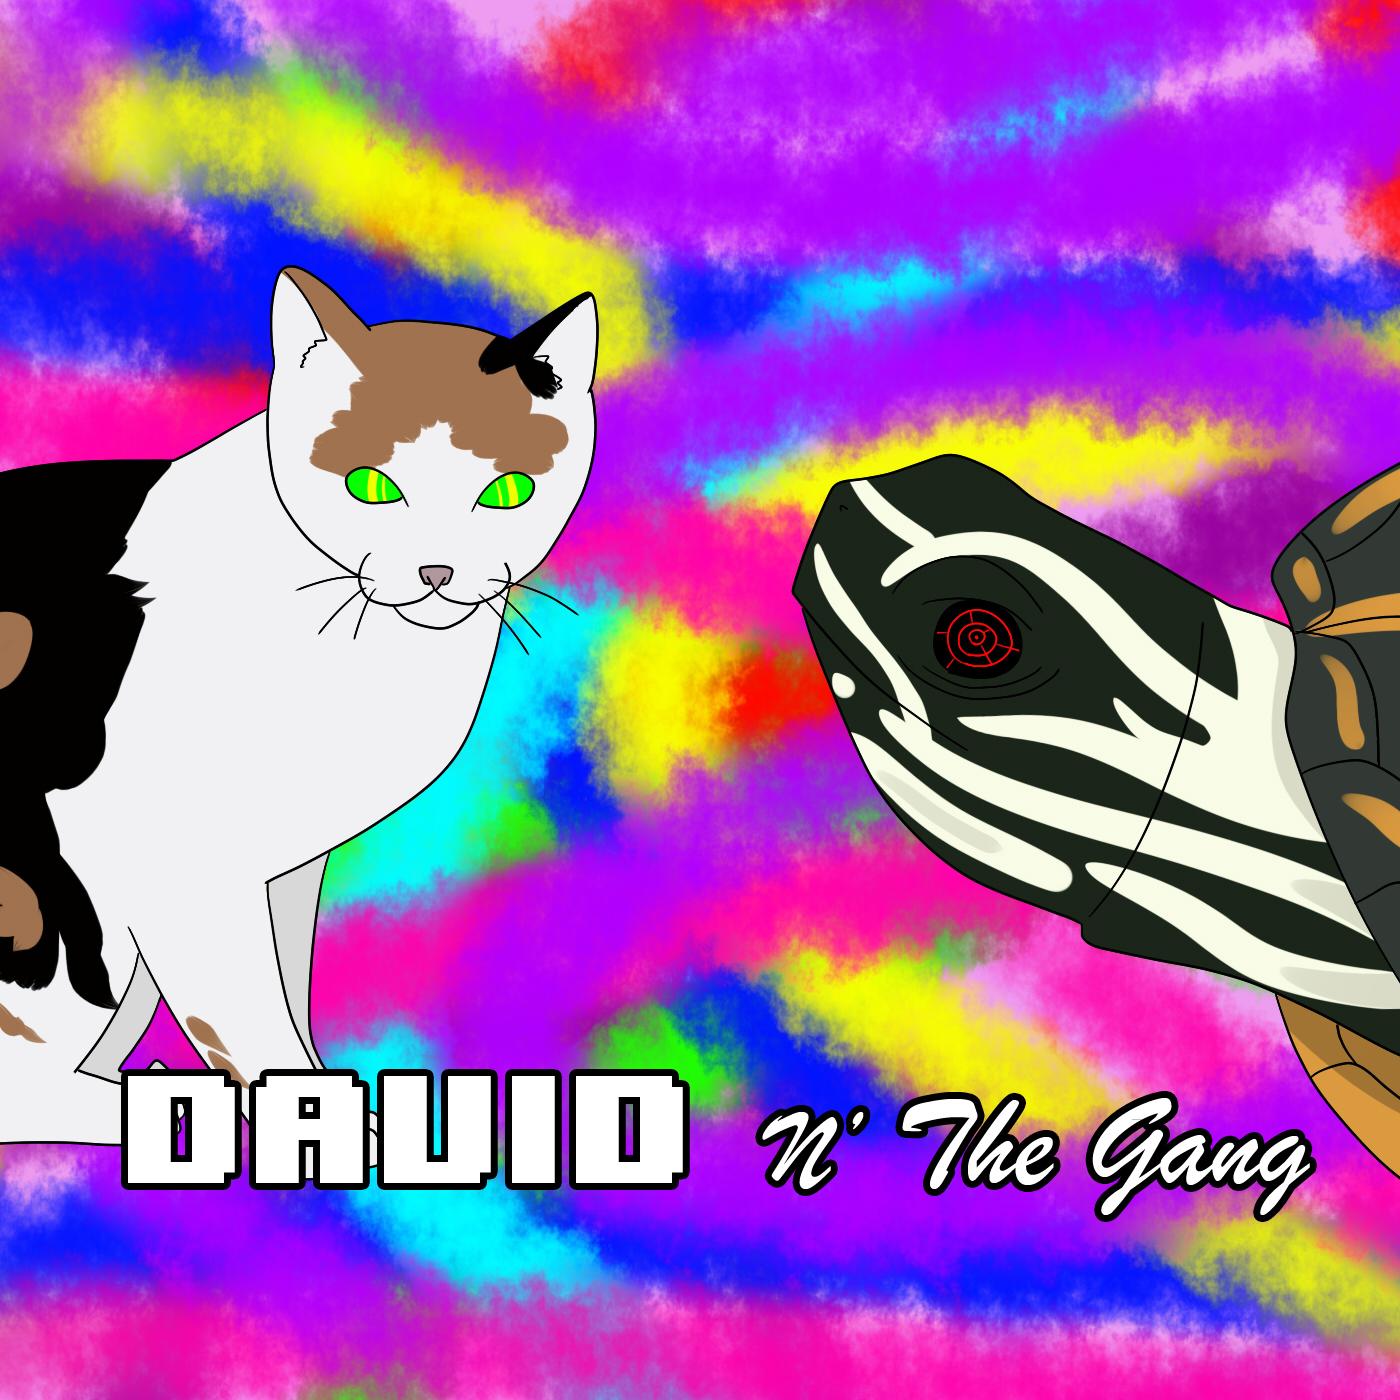 David n' the Gang